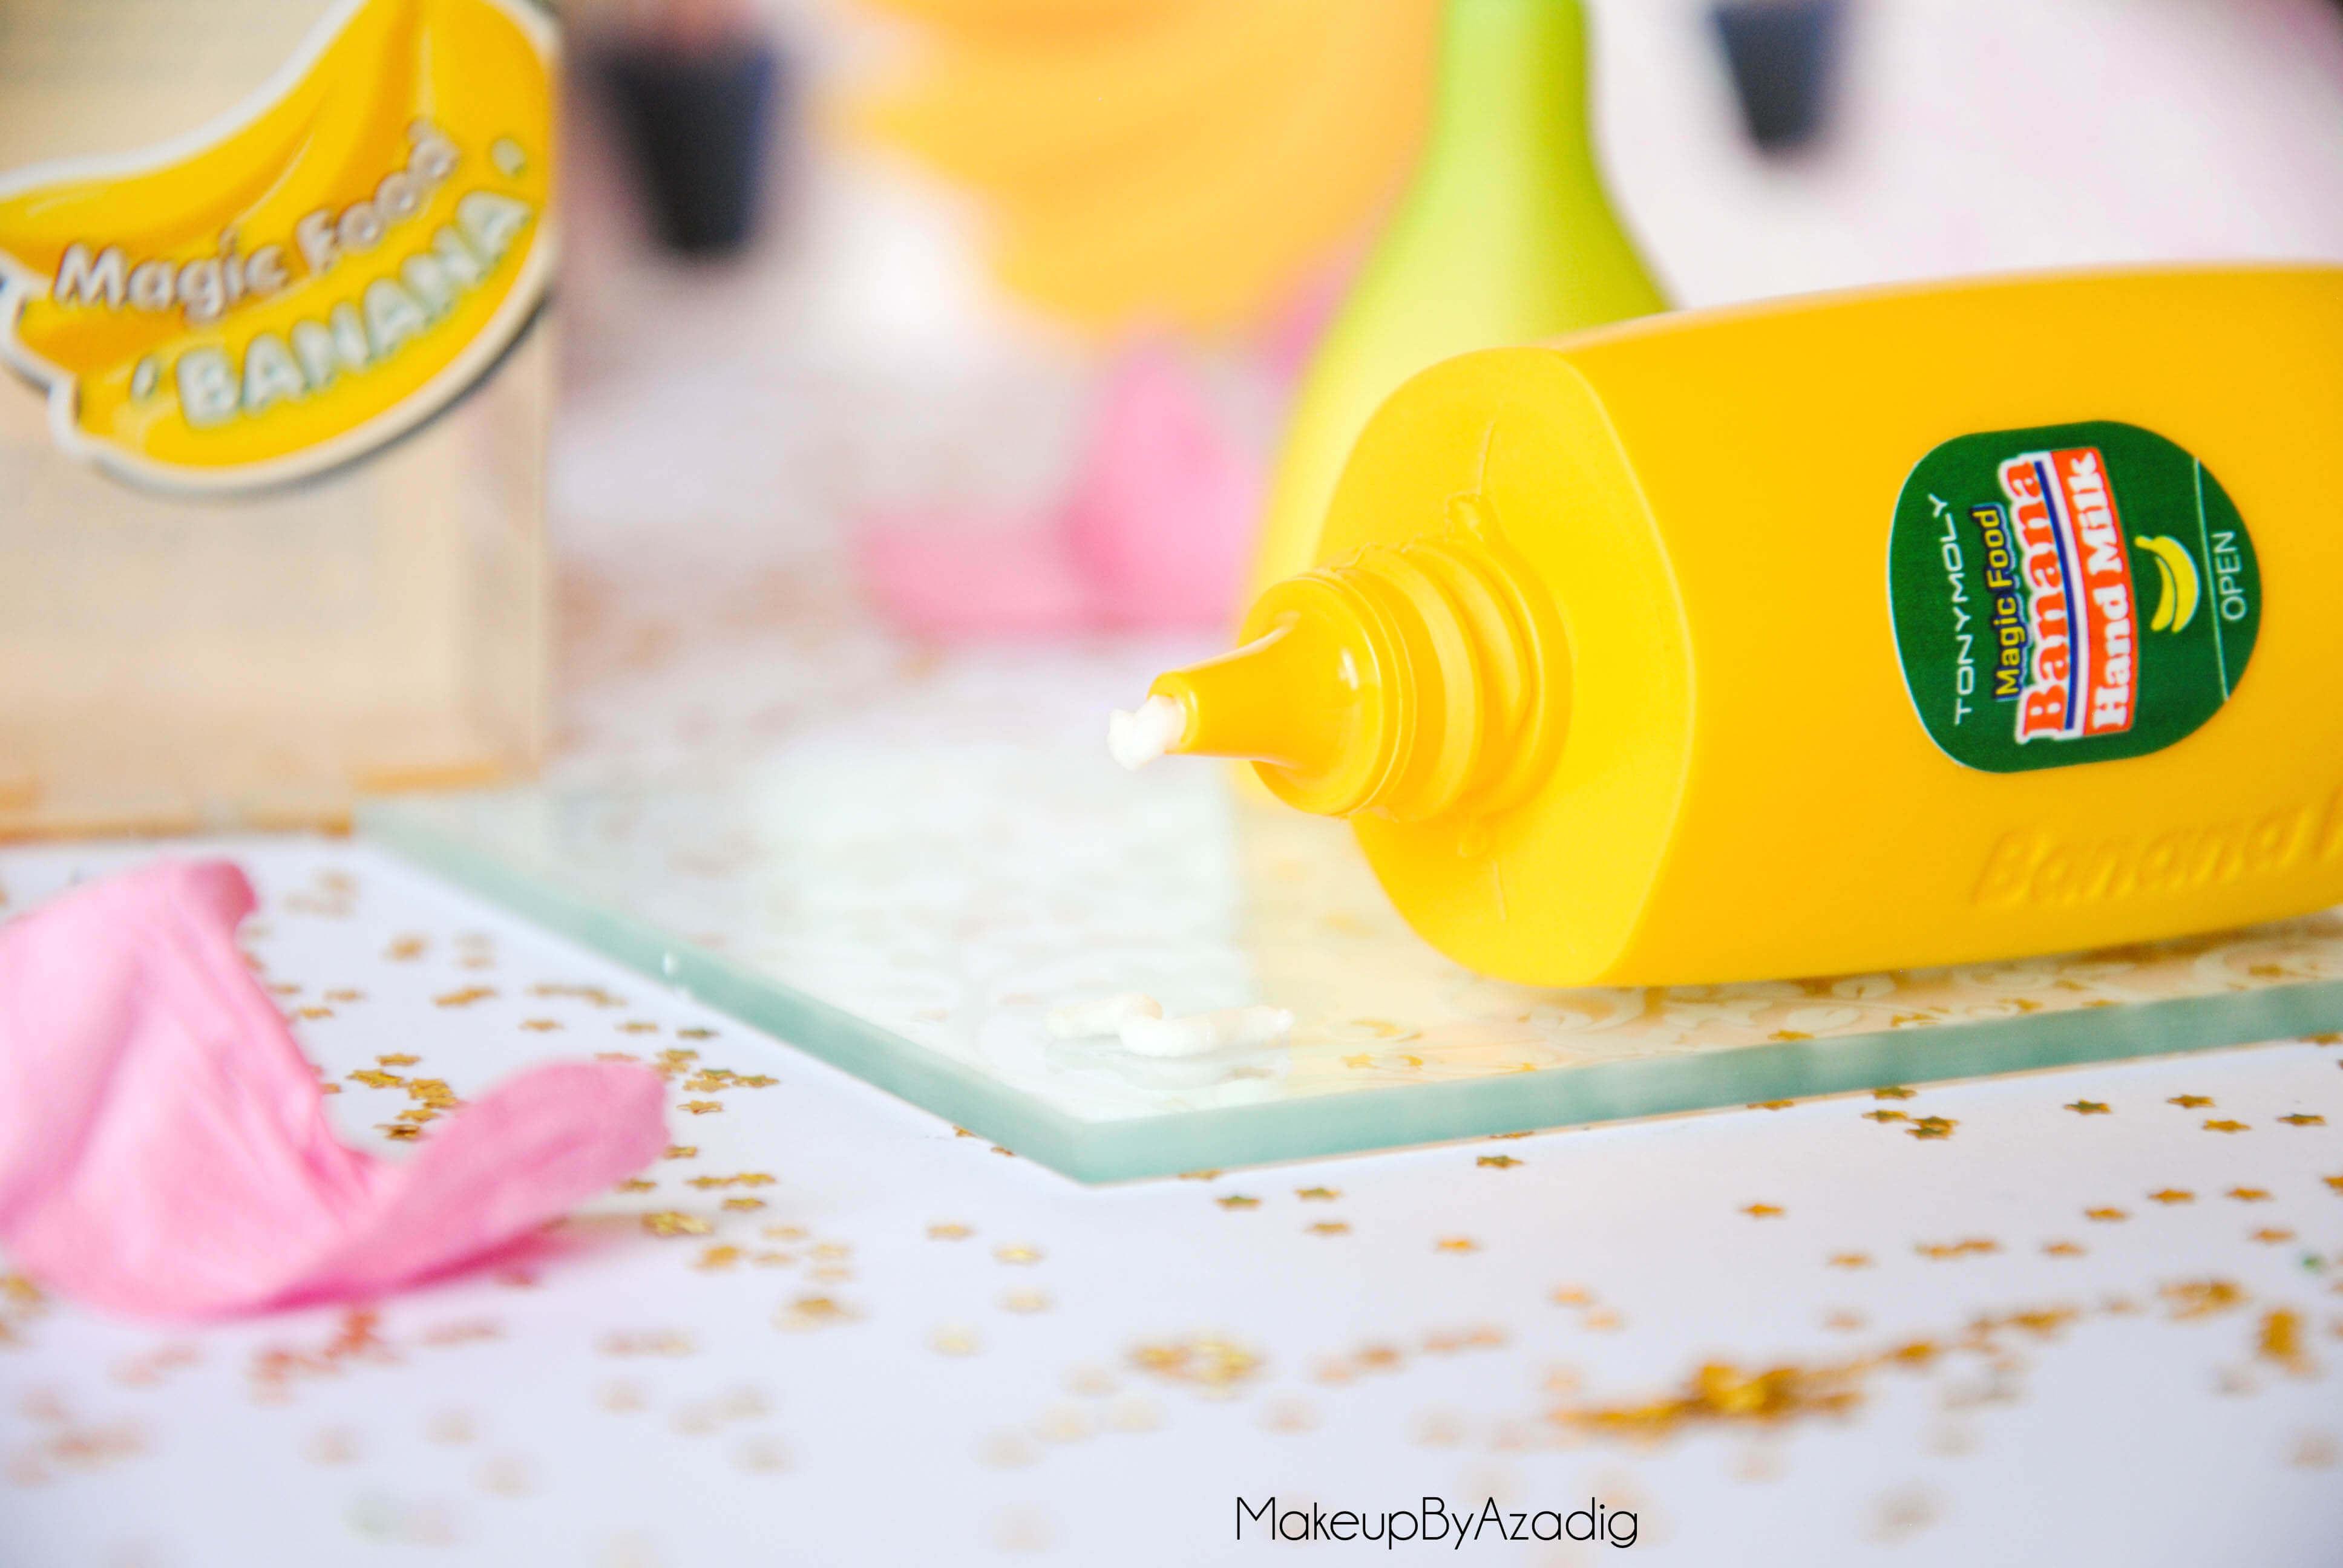 magic-food-banana-hand-milk-tonymoly-banane-creme-main-hand-cream-review-revue-paris-dijon-troyes-makeupbyazadig-kawai-texture